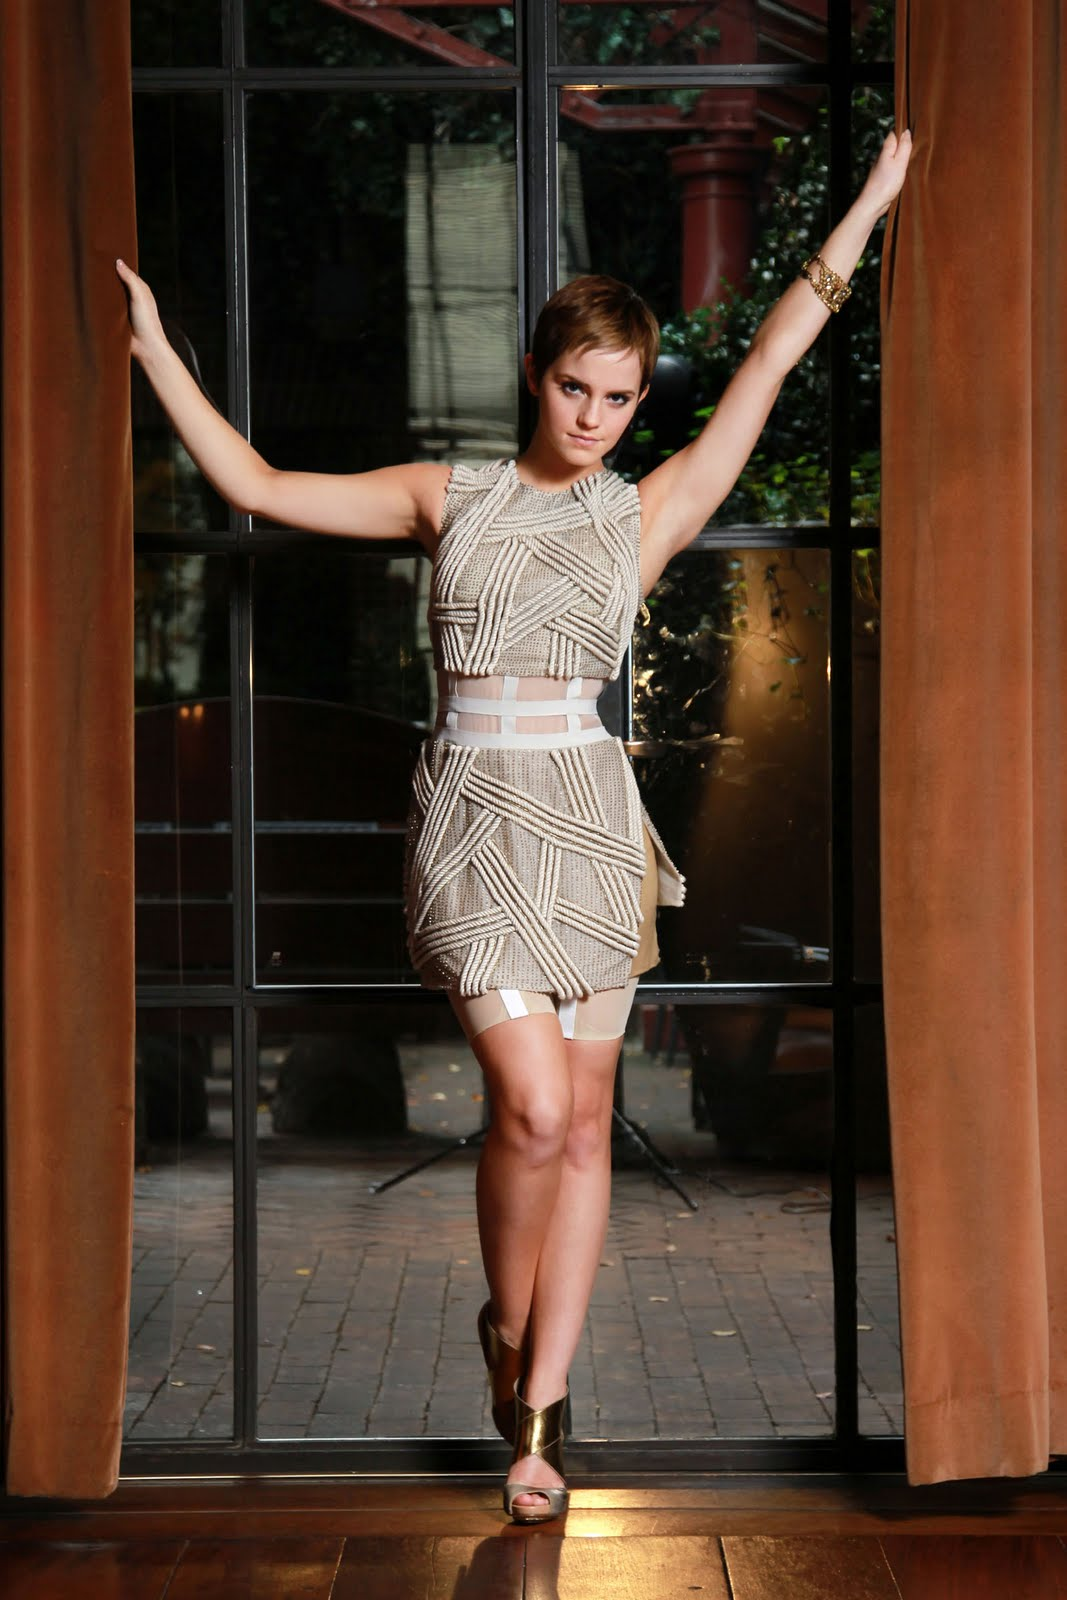 Hd wallpaper emma watson - Emma Watson Photoshoot Dress Images Amp Pictures Becuo